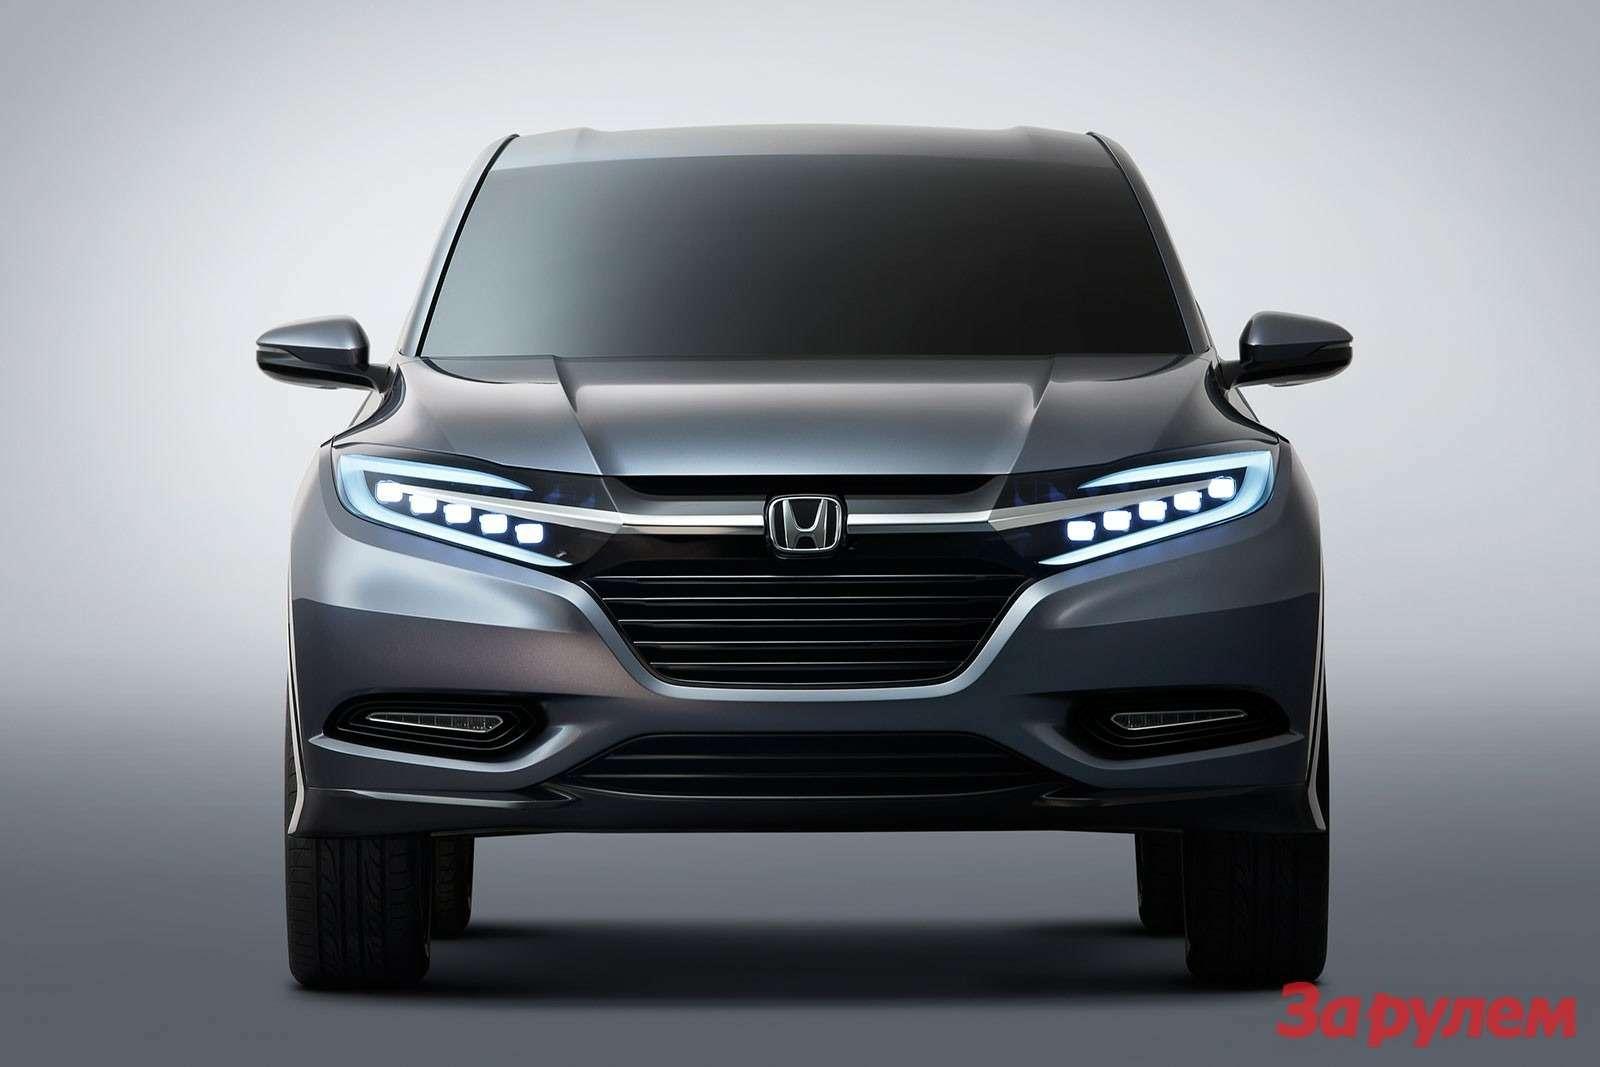 2013 Honda Urban SUV Concept 04